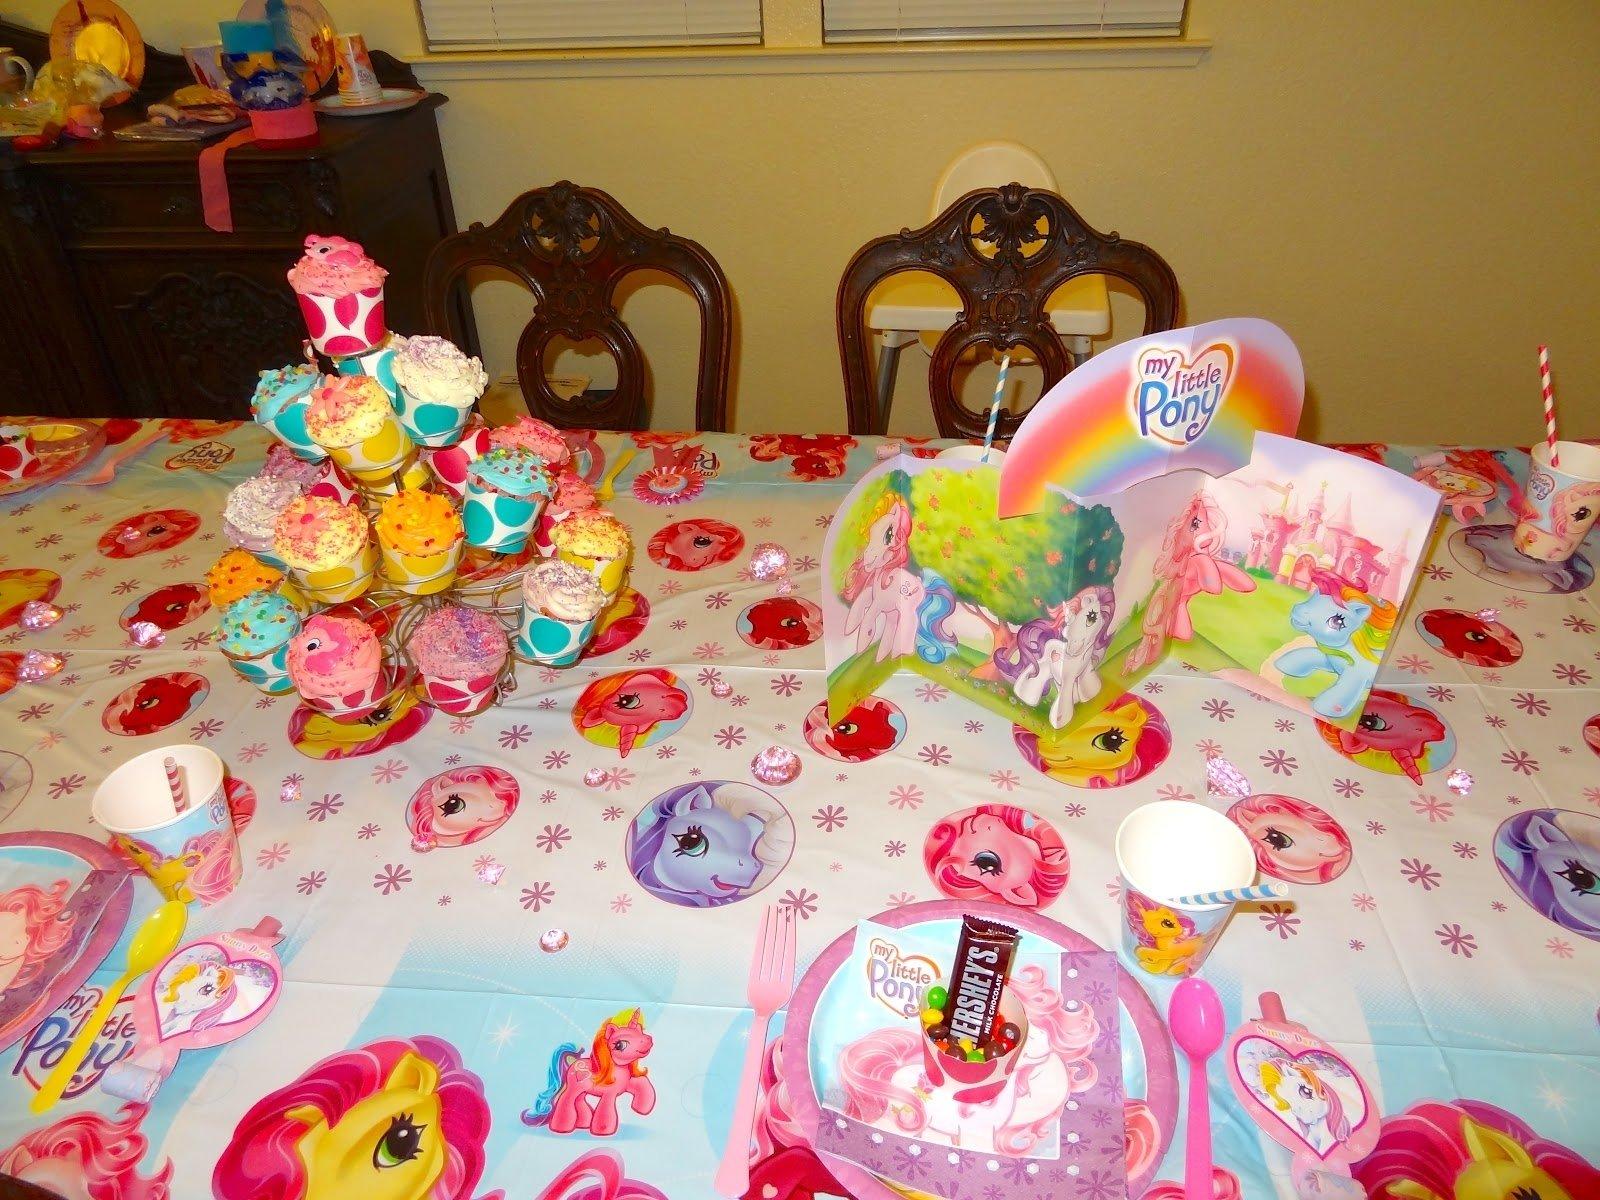 10 Stylish My Little Pony Friendship Is Magic Birthday Party Ideas welcome to the krazy kingdom tayas 5th birthday party my little pony 3 2020